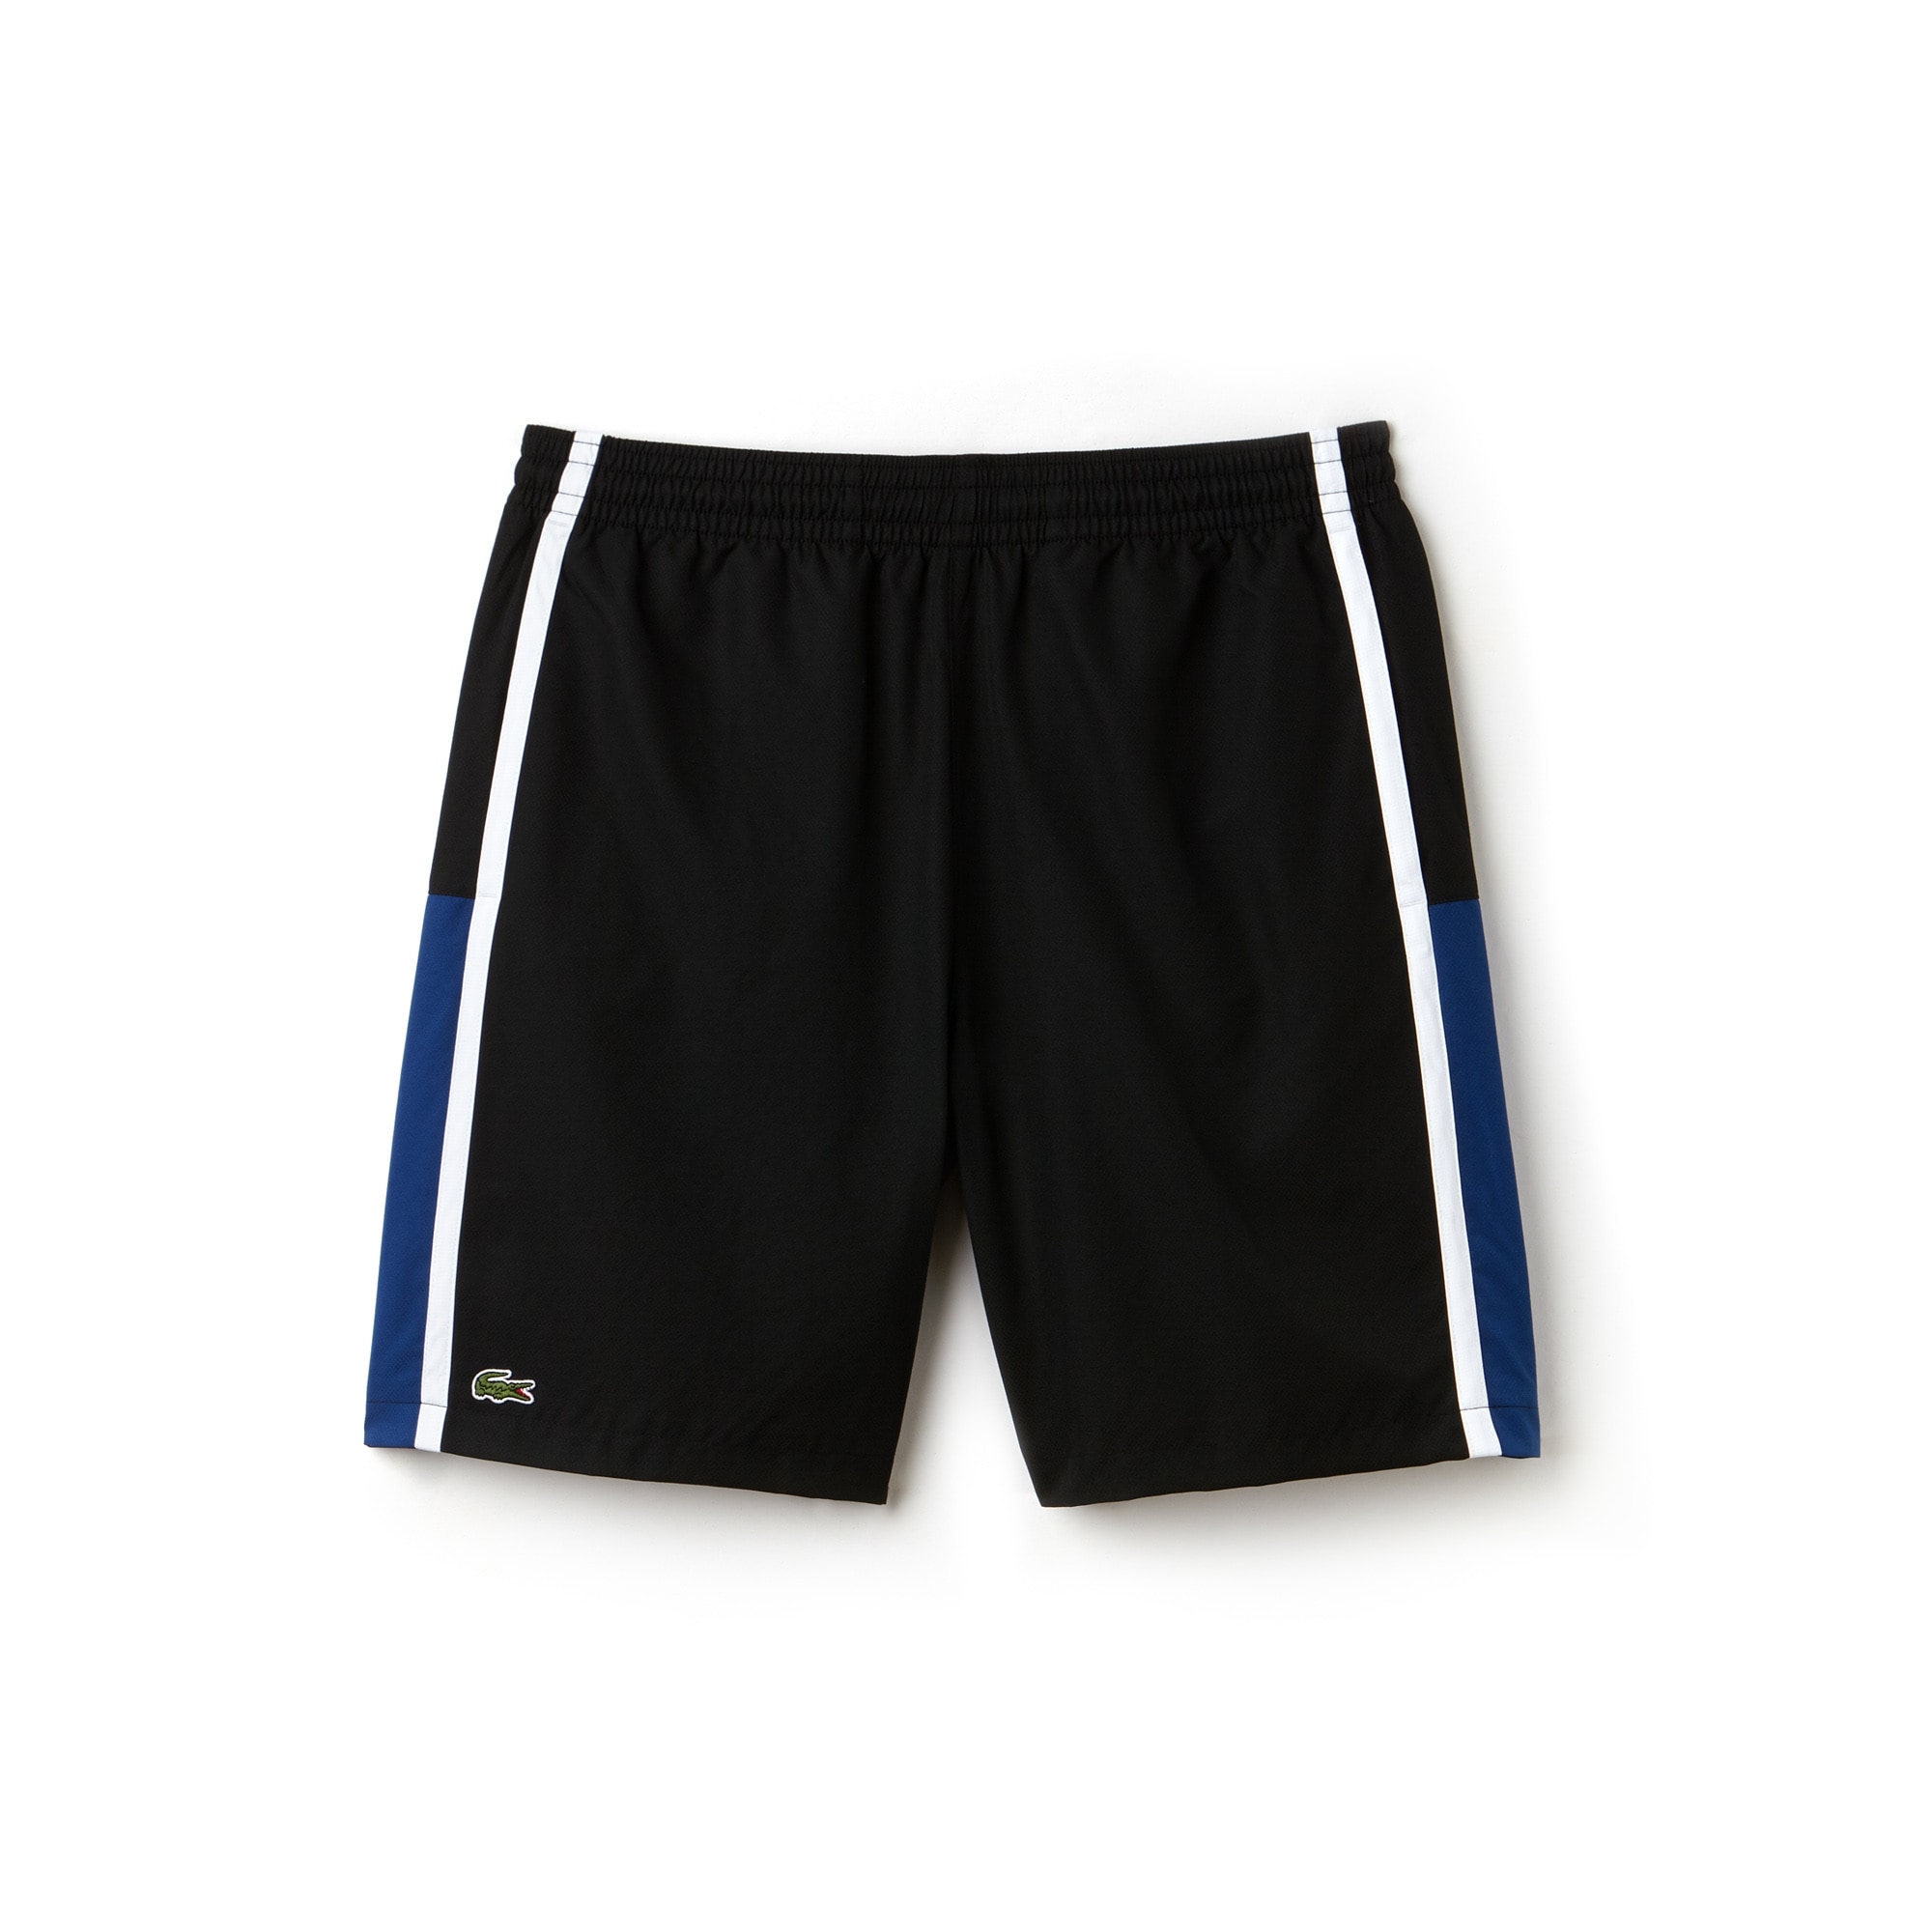 Men's Lacoste SPORT Colorblock Taffeta Tennis Shorts